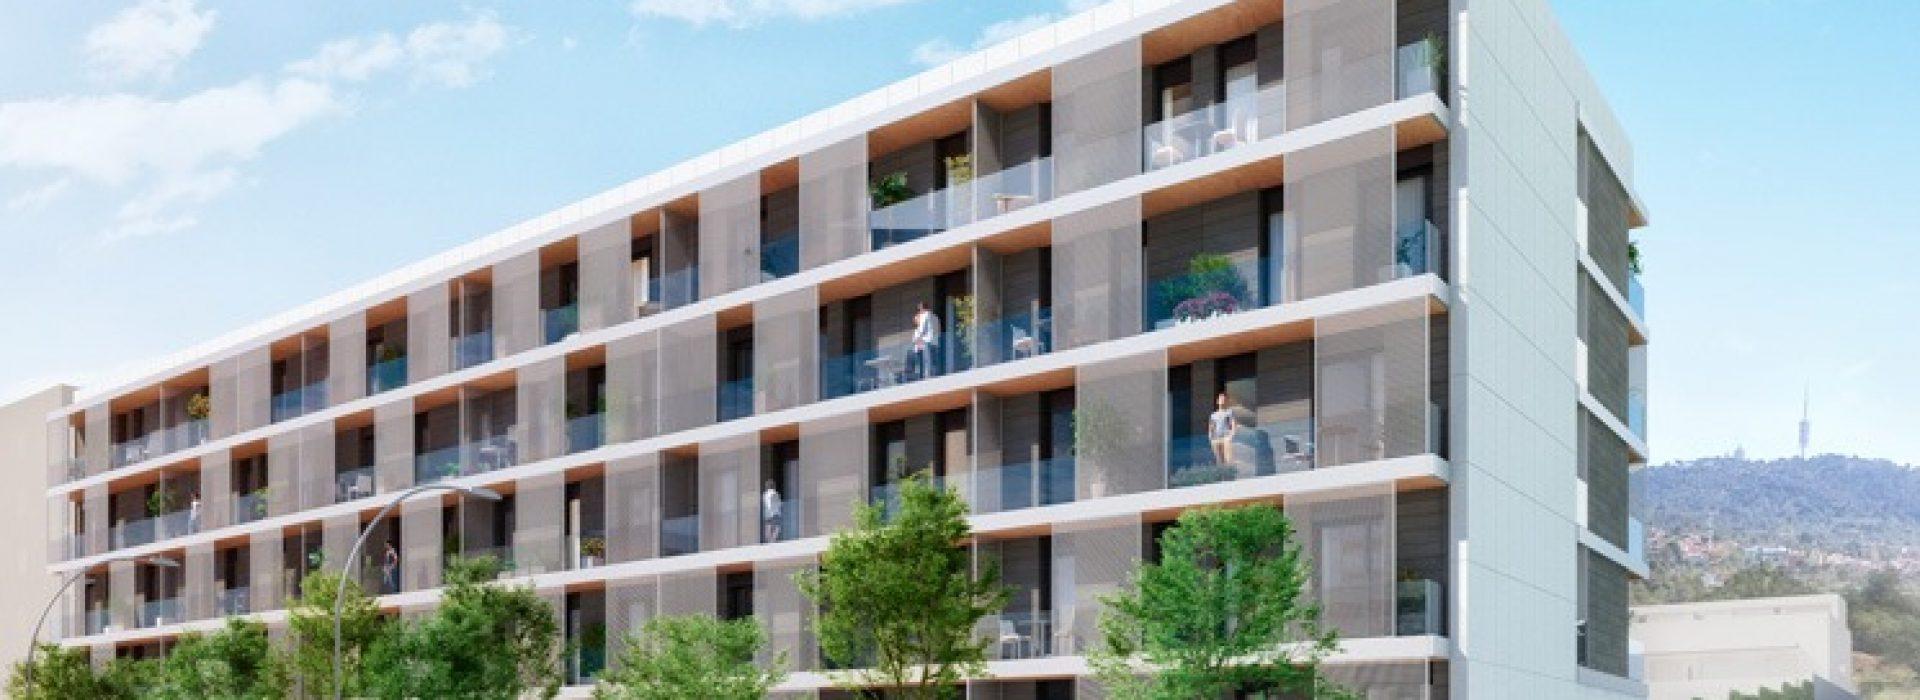 residencial-mirador-mas-llui01